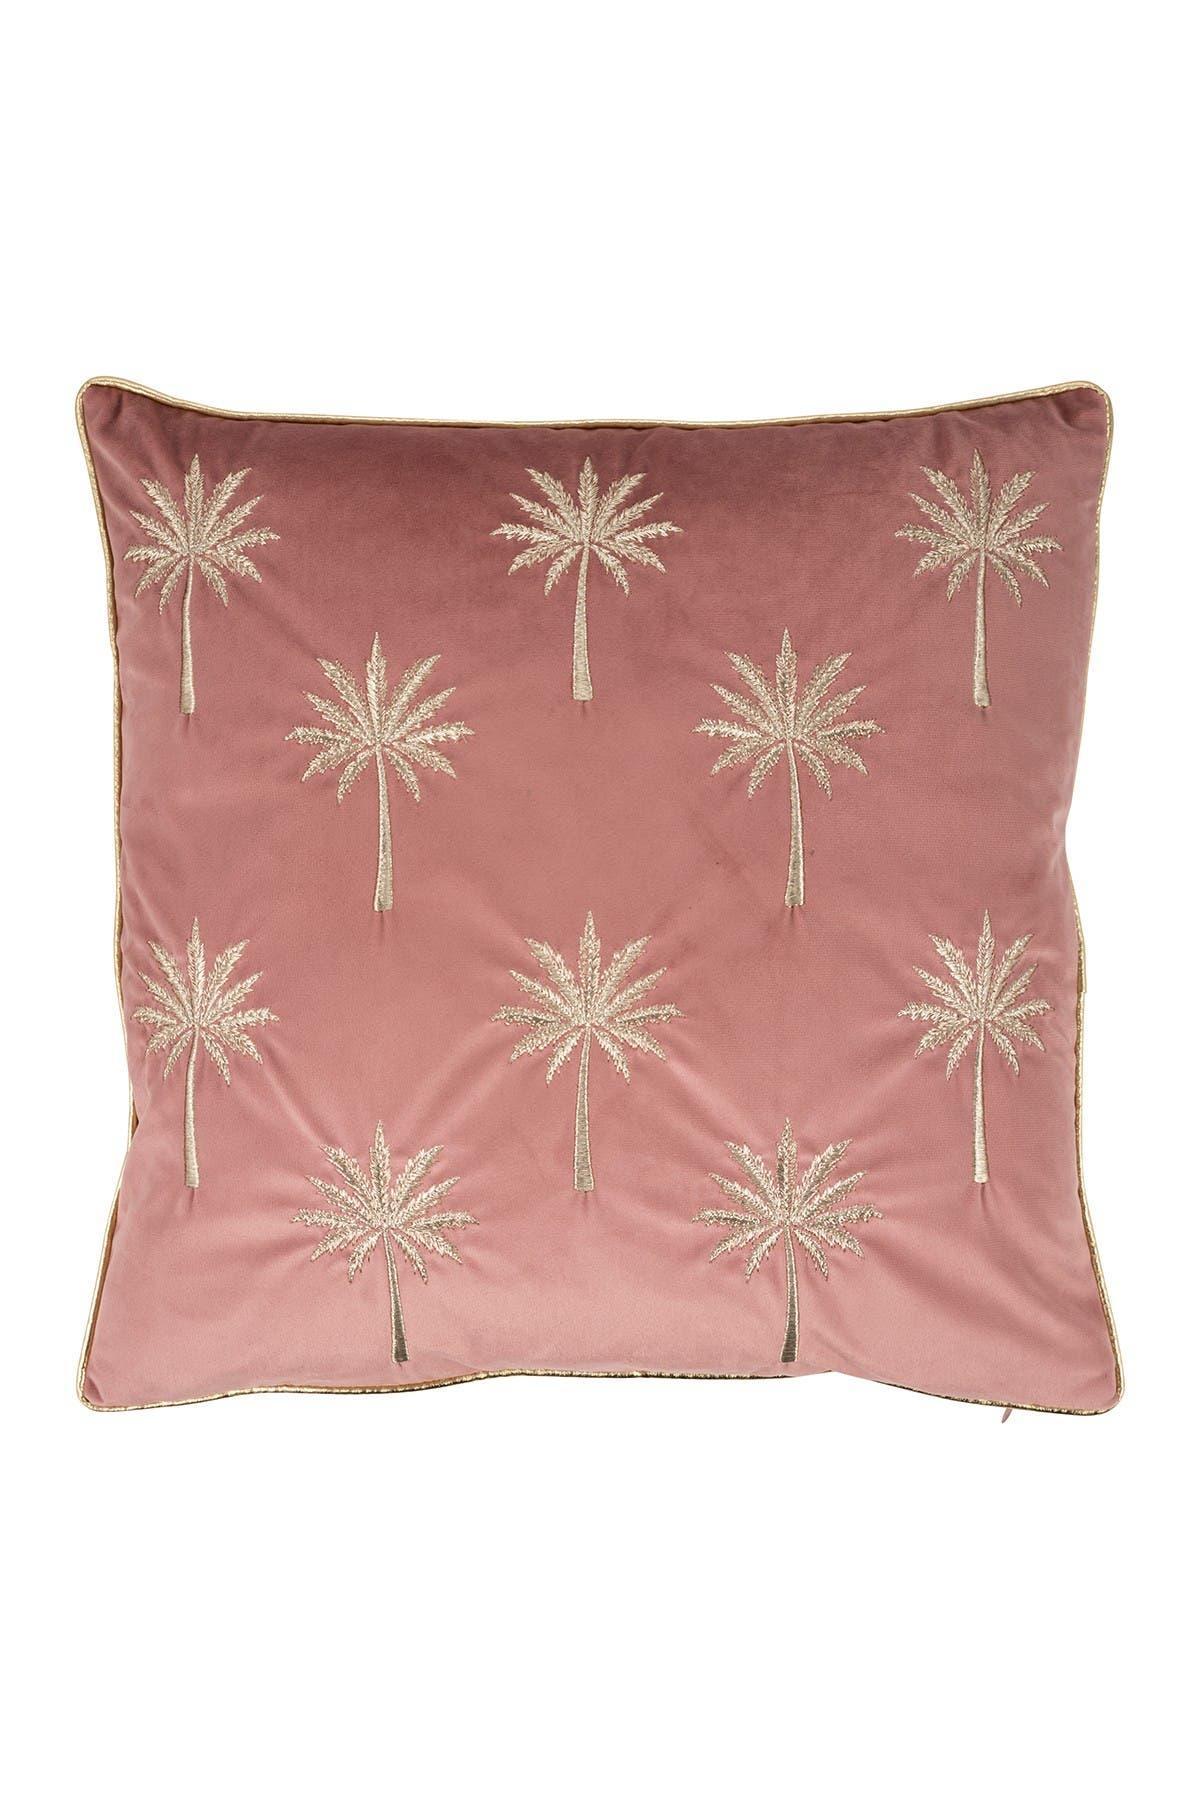 Eightmood Throw Pillow Dusty Pink Nordstrom Rack